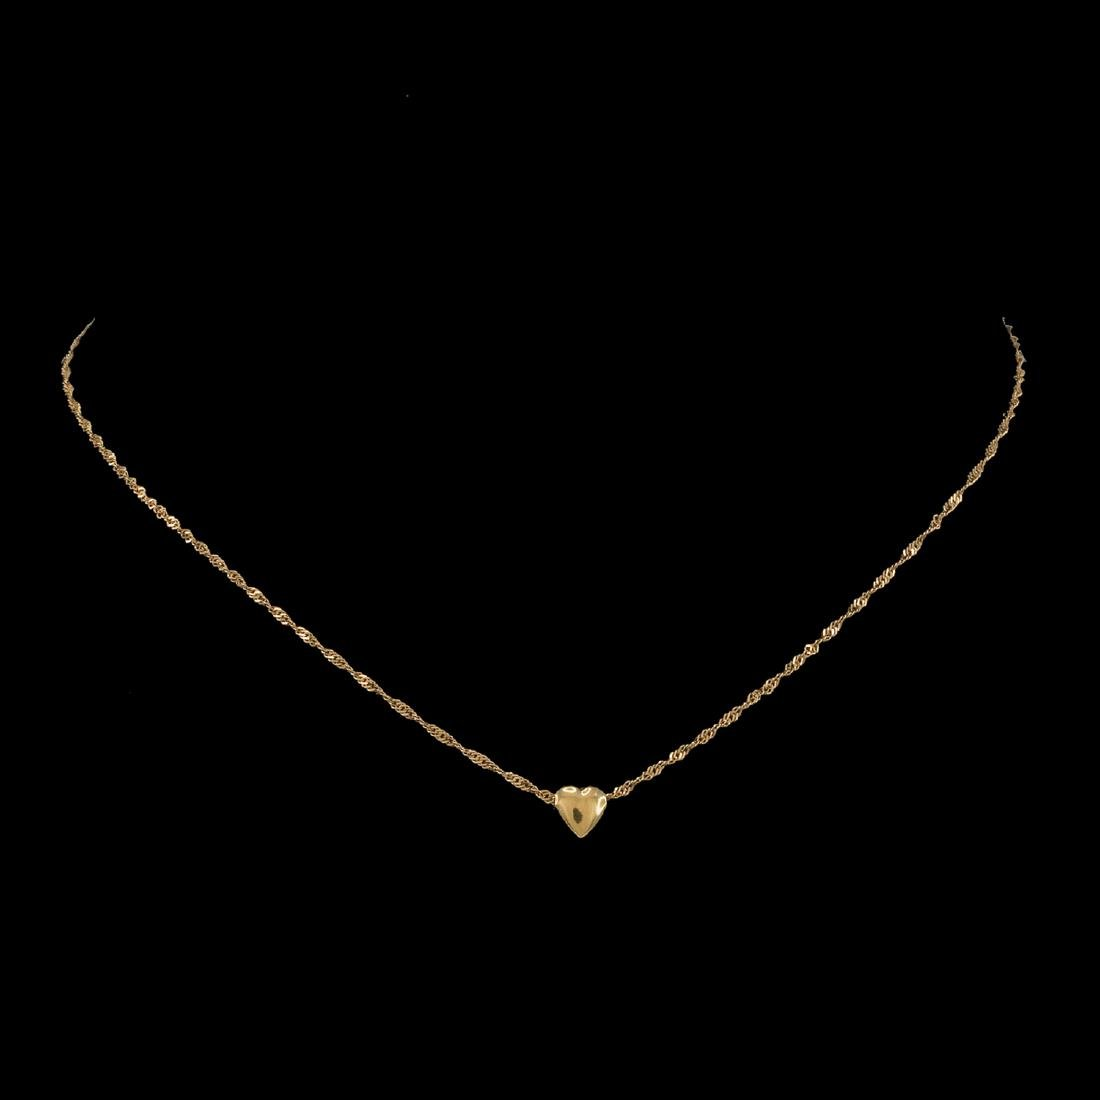 *Fine Jewelry 14KT Gold Singapore W Puffed Heart 1.4GM.